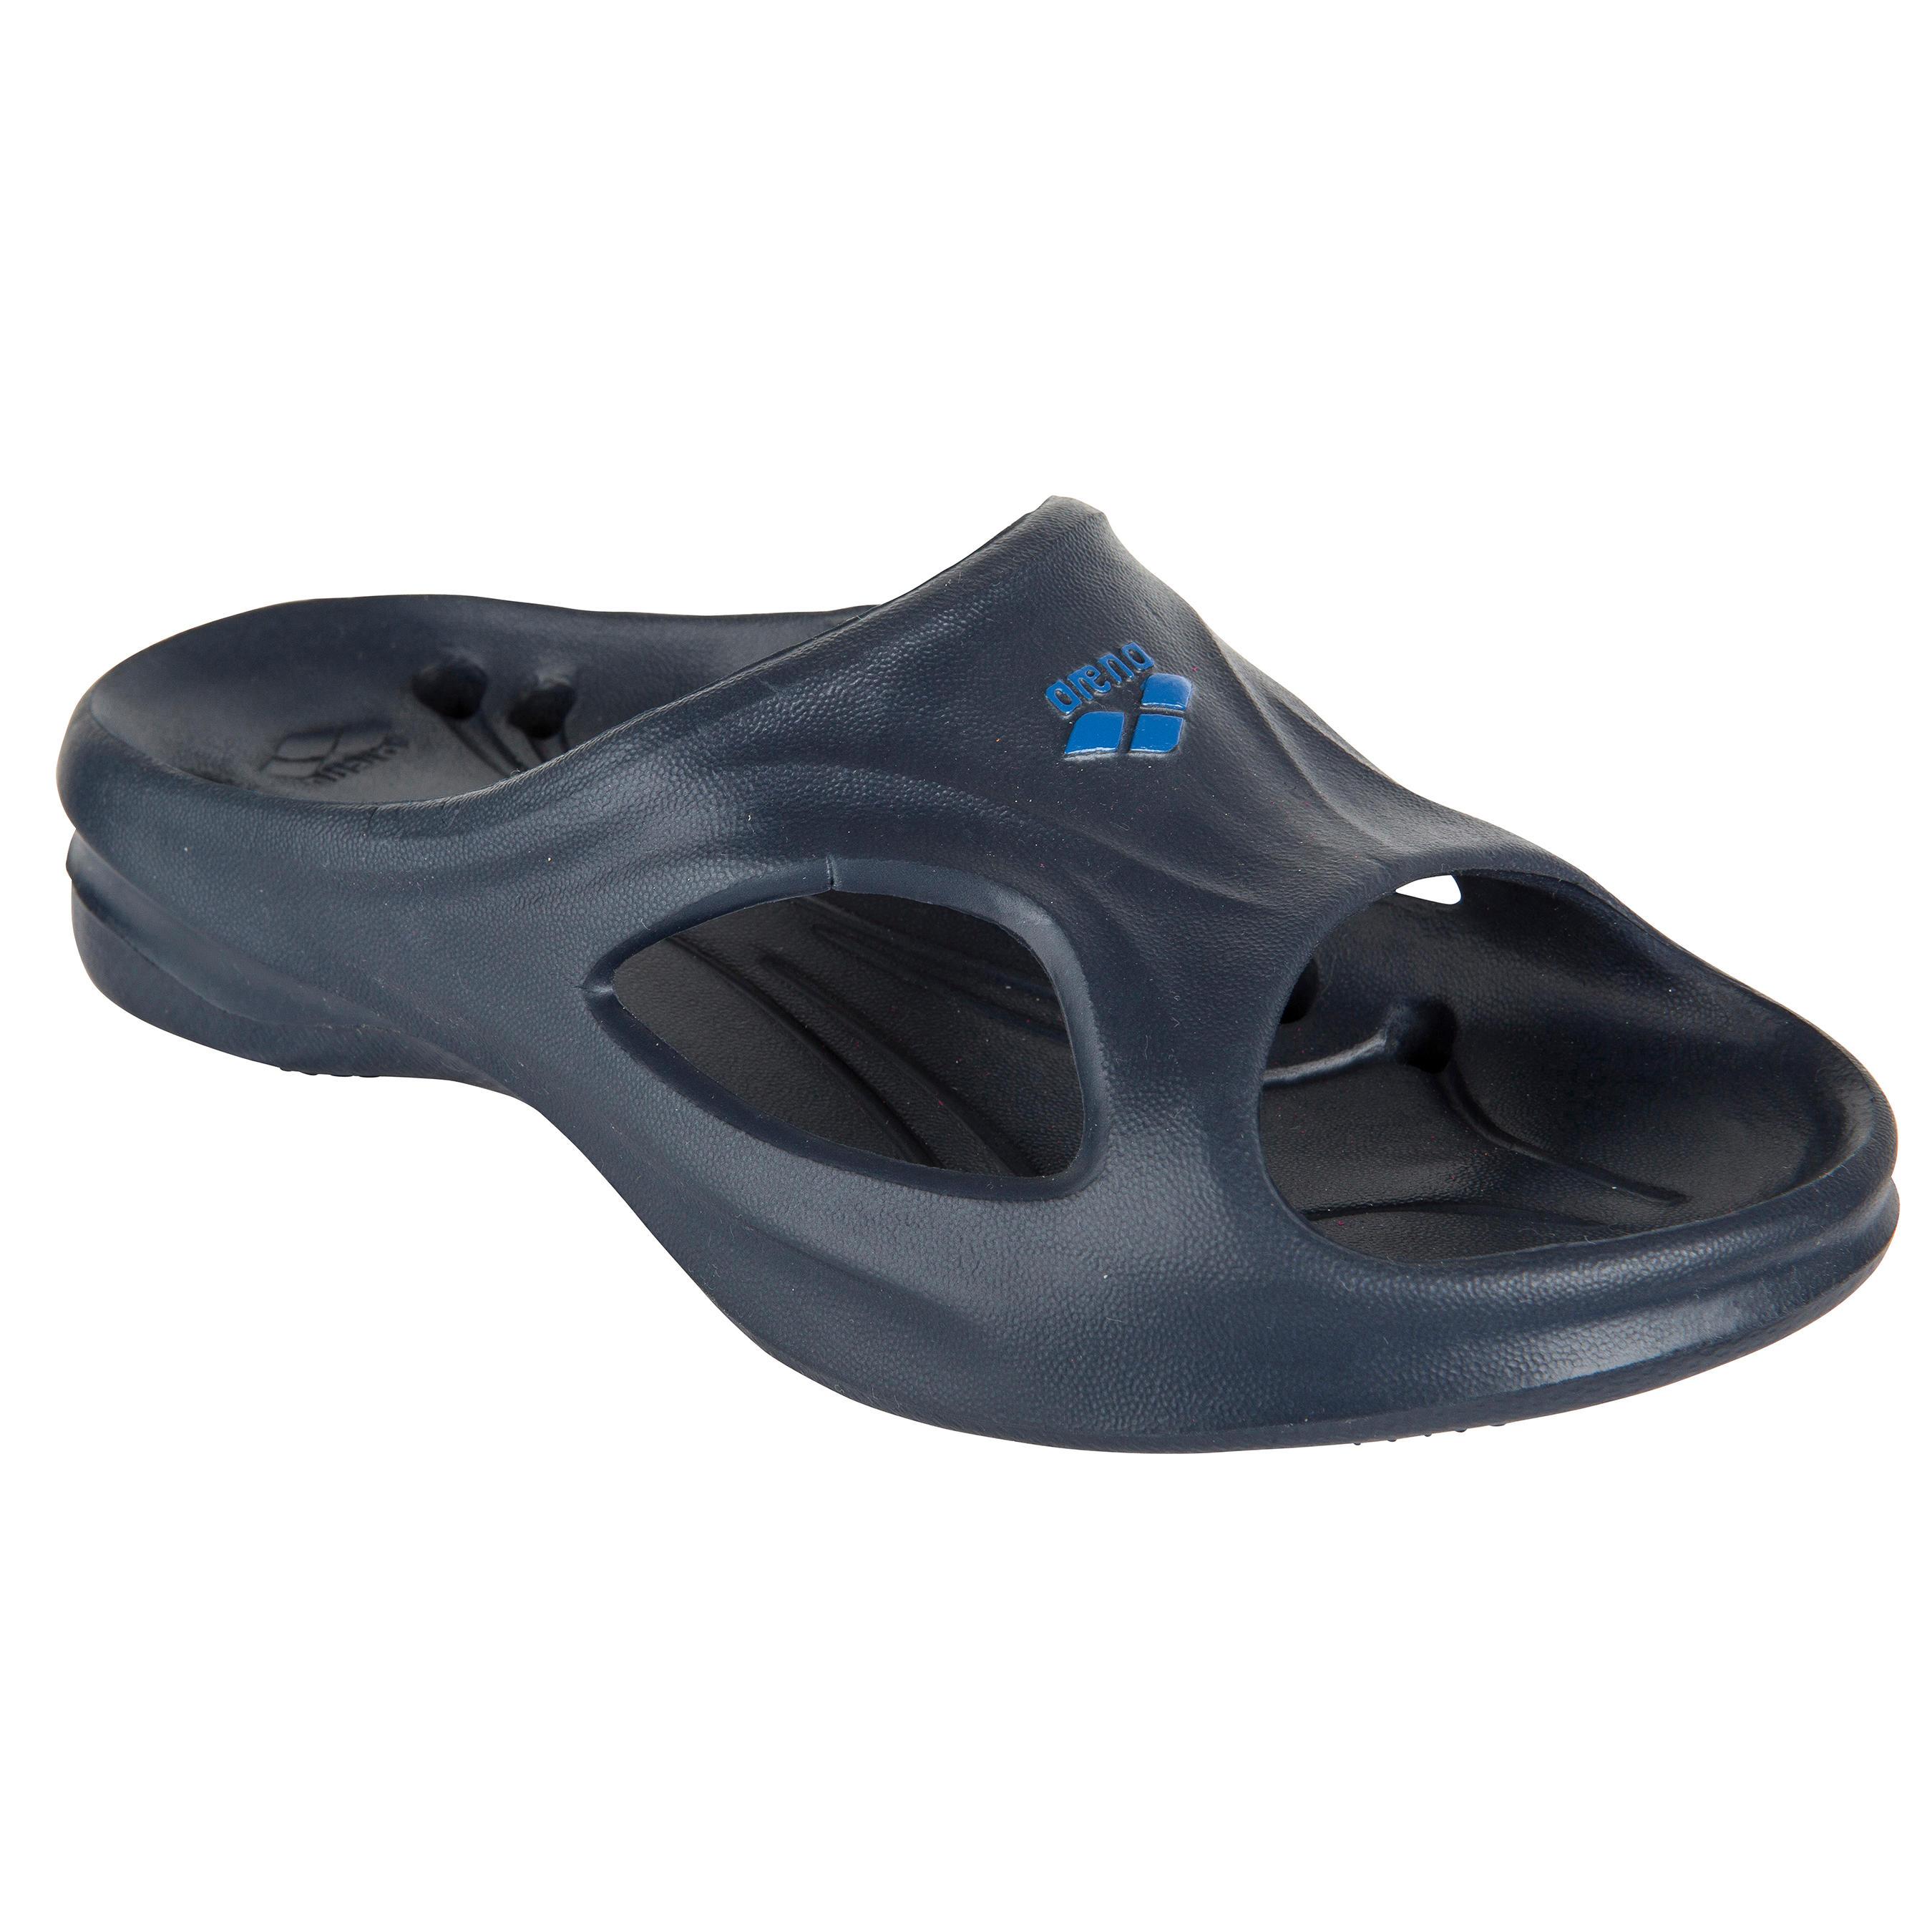 arena Hydrosoft Jr Ho Chaussures de Plage /& Piscine Fille